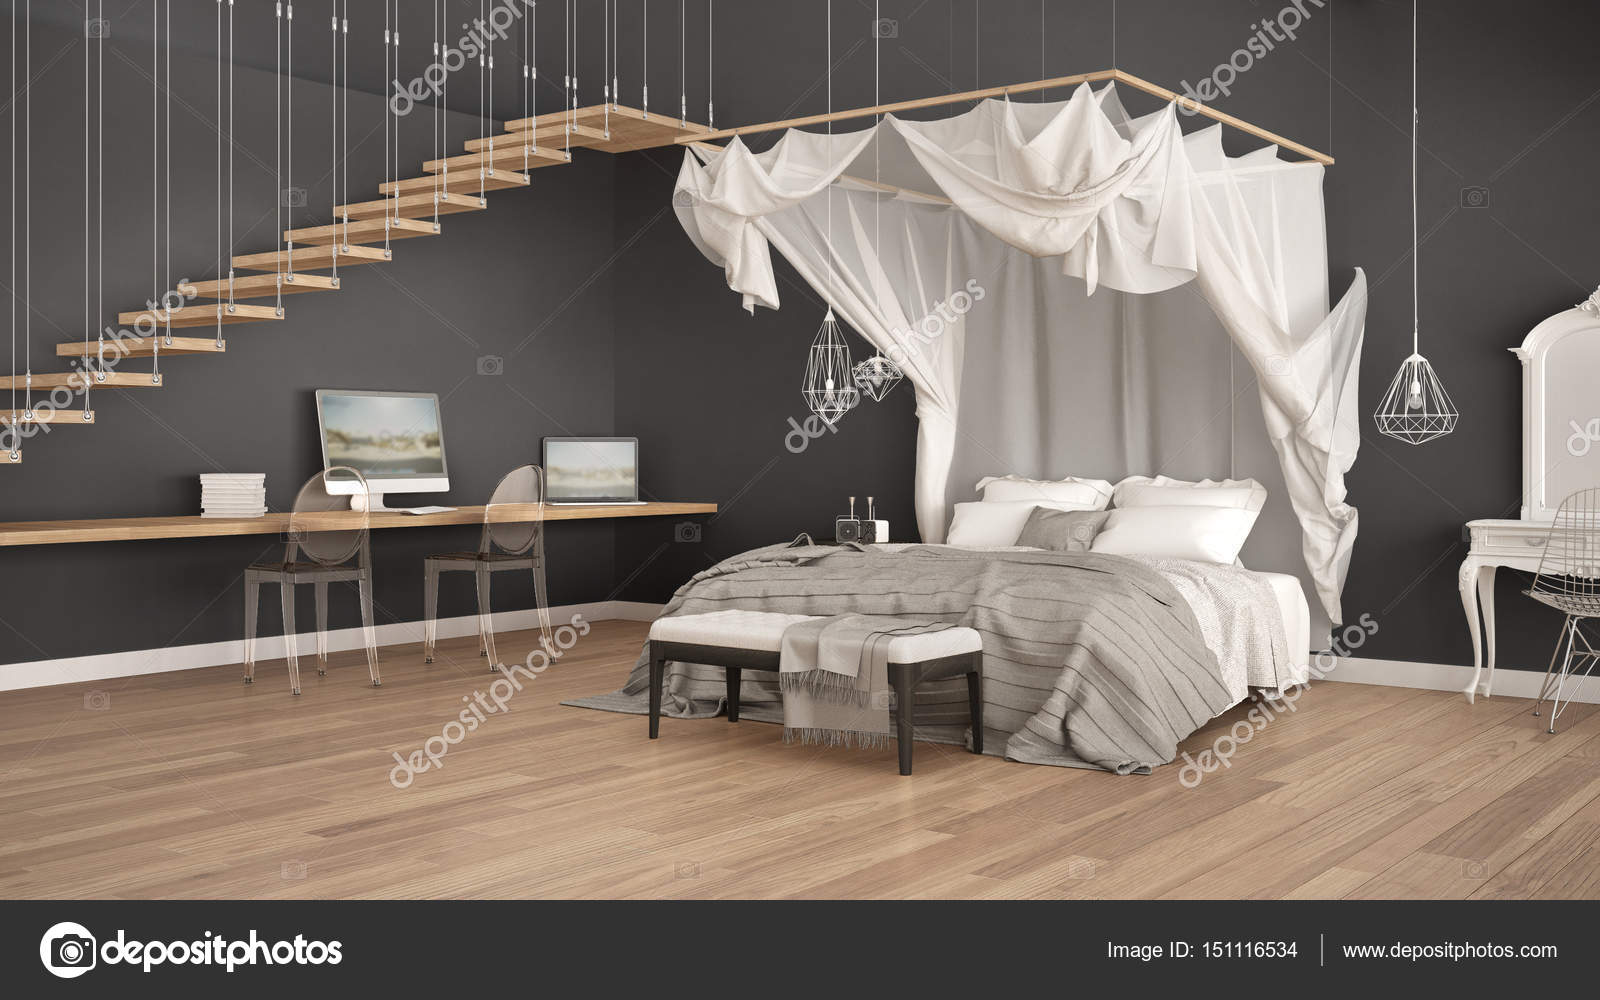 Hemelbed In Slaapkamer : Veel opbergruimte in poolse slaapkamer slaapkamer ideeën